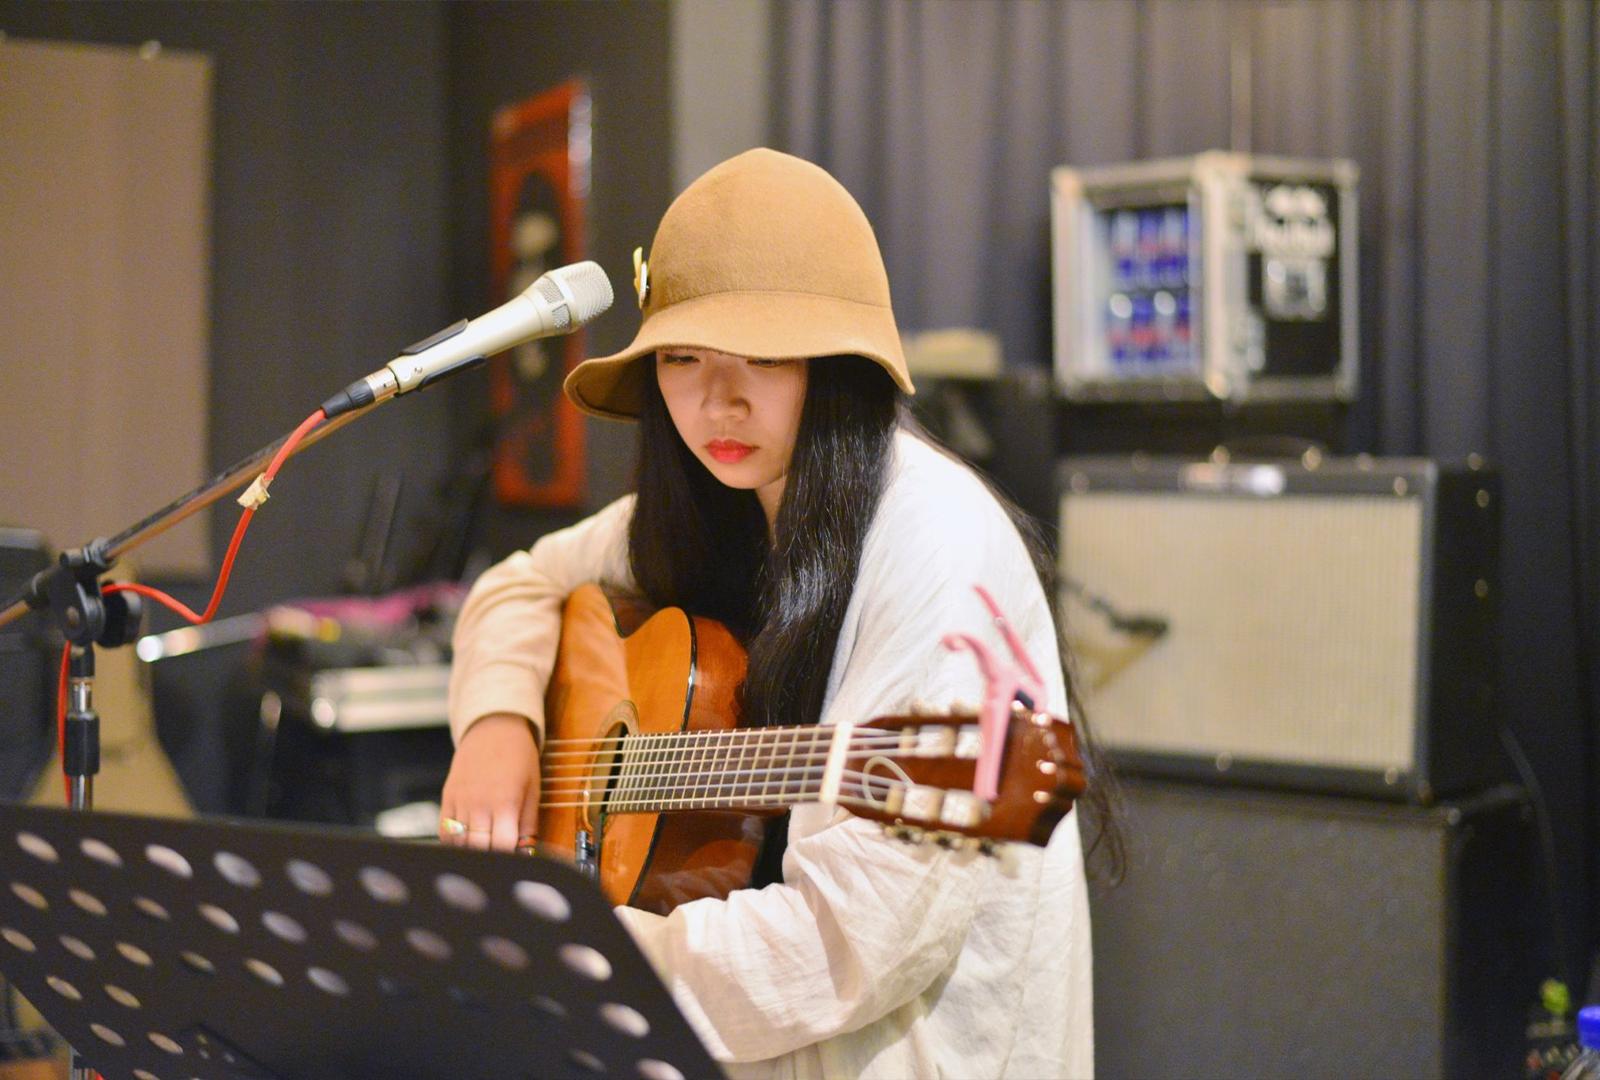 Ichiko Aoba soundtracks an imaginary film on Windswept Adan